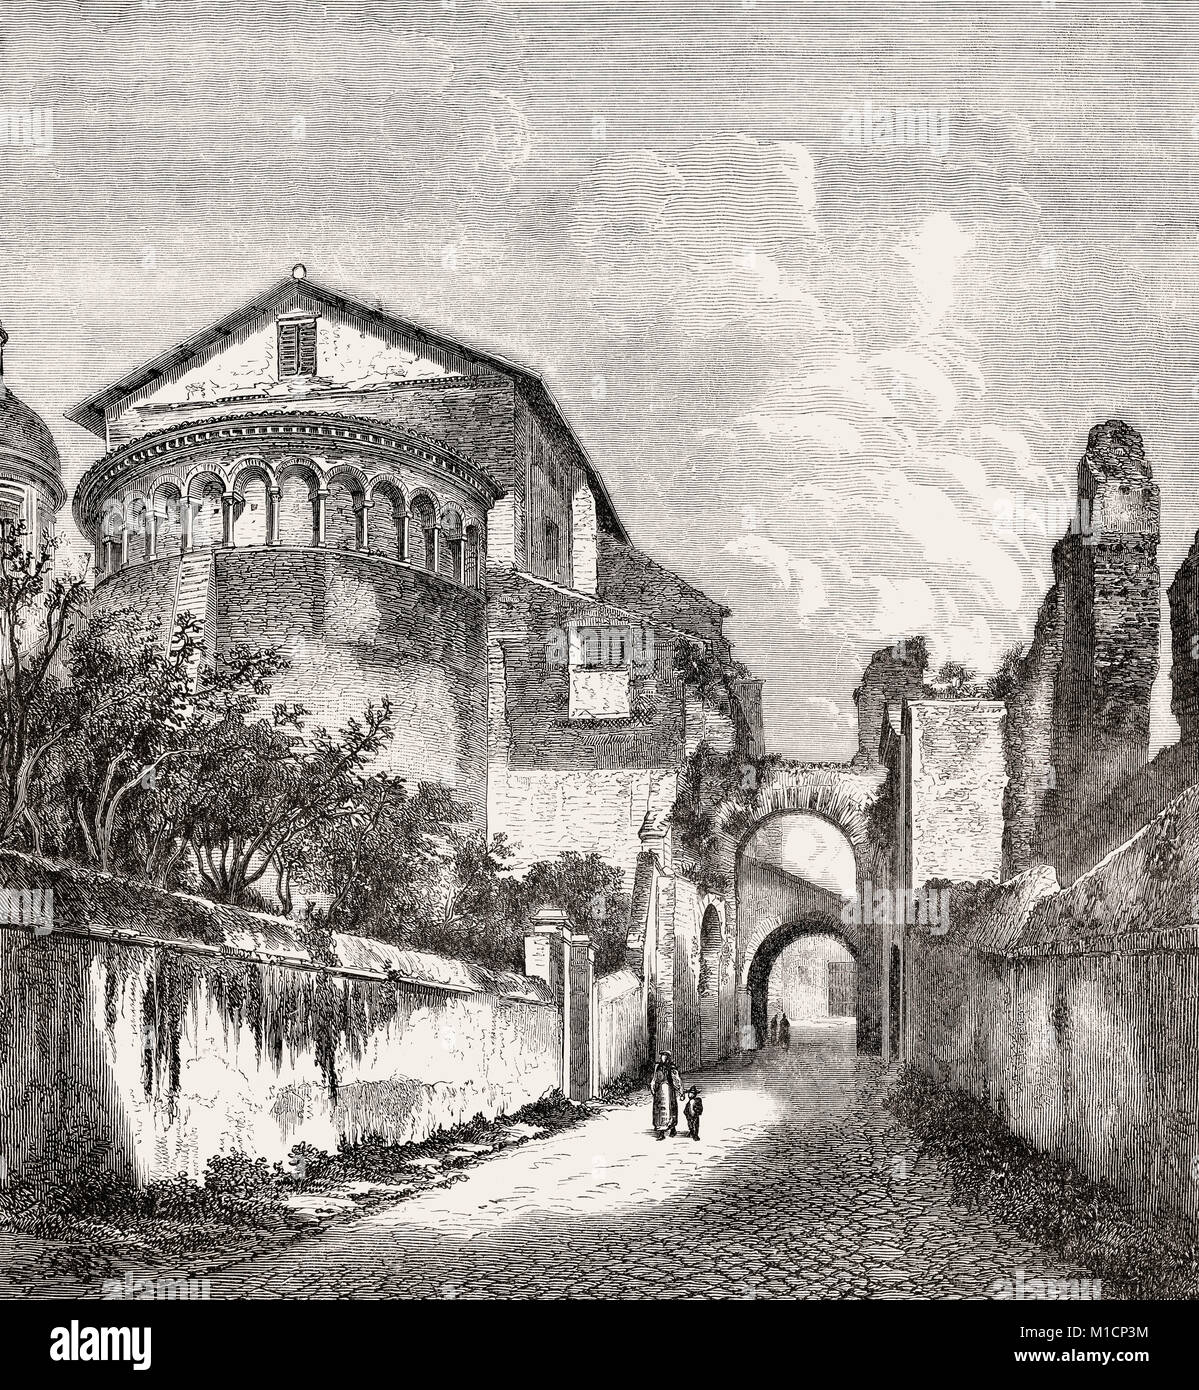 The Basilica of Saints John and Paul on the Caelian Hill, Rome, Italy, 19th Century Stock Photo